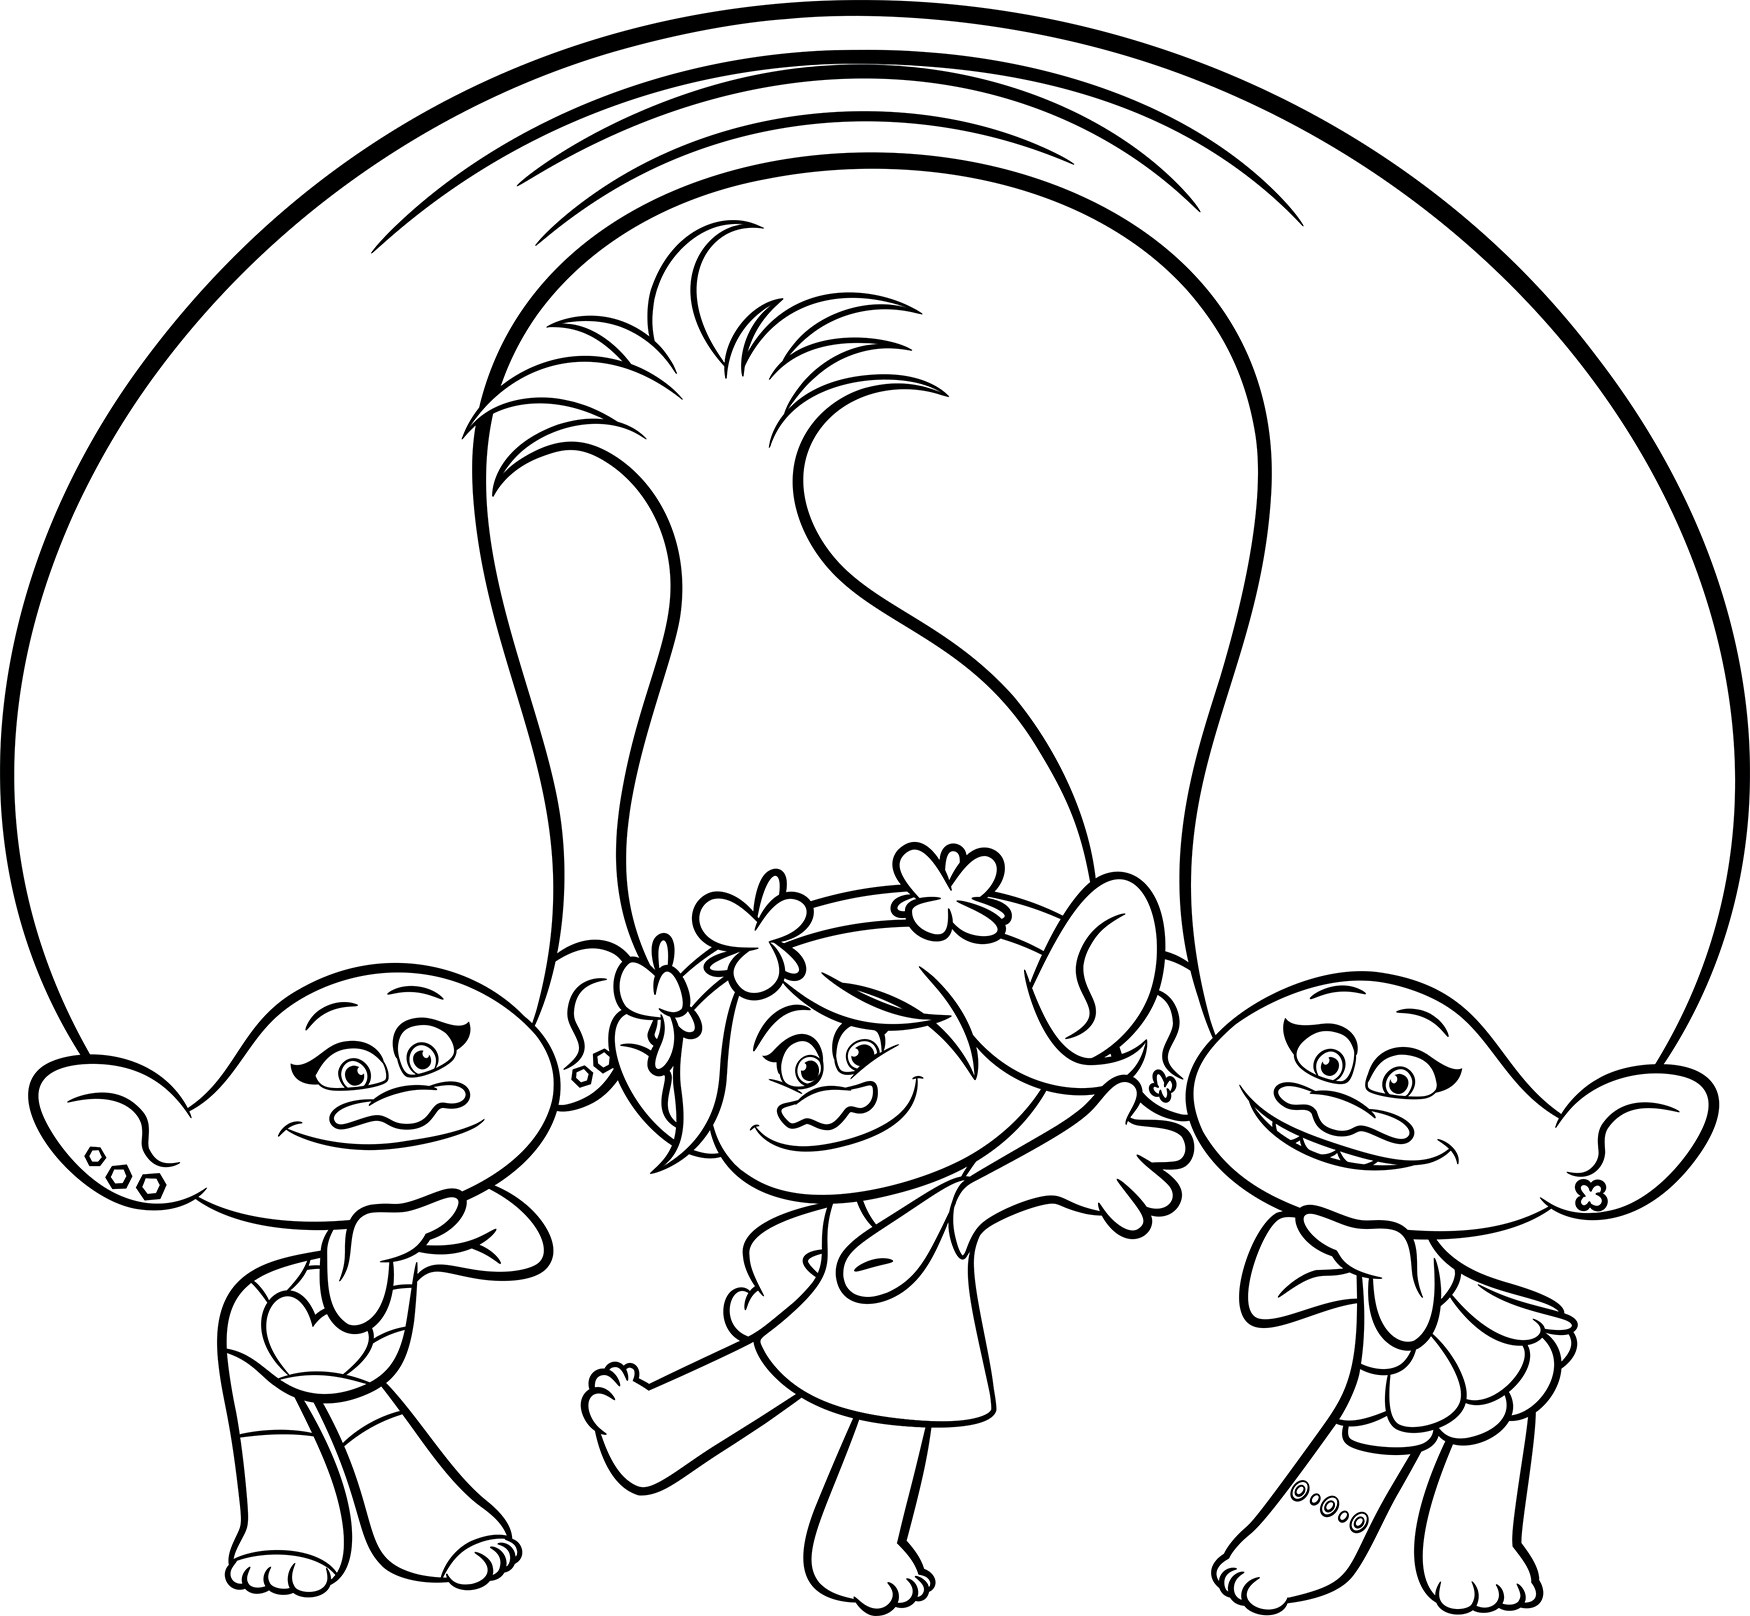 trolls_activitysheet_coloringpage14.jpg